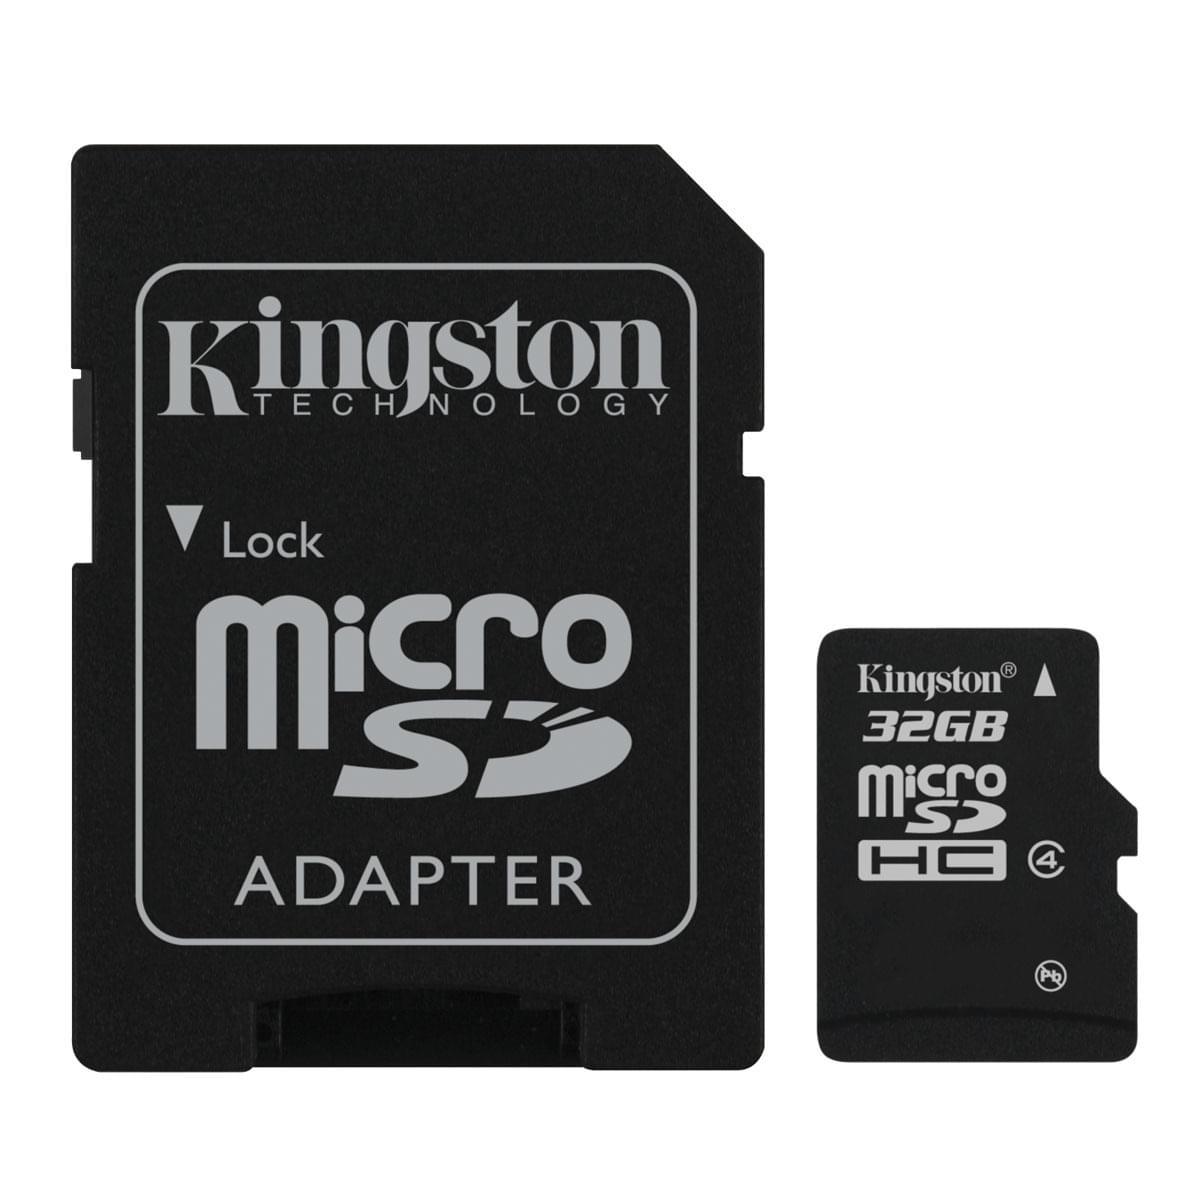 Kingston Micro SDHC 32Go SDC4/32GB class 4 - Carte mémoire - 0